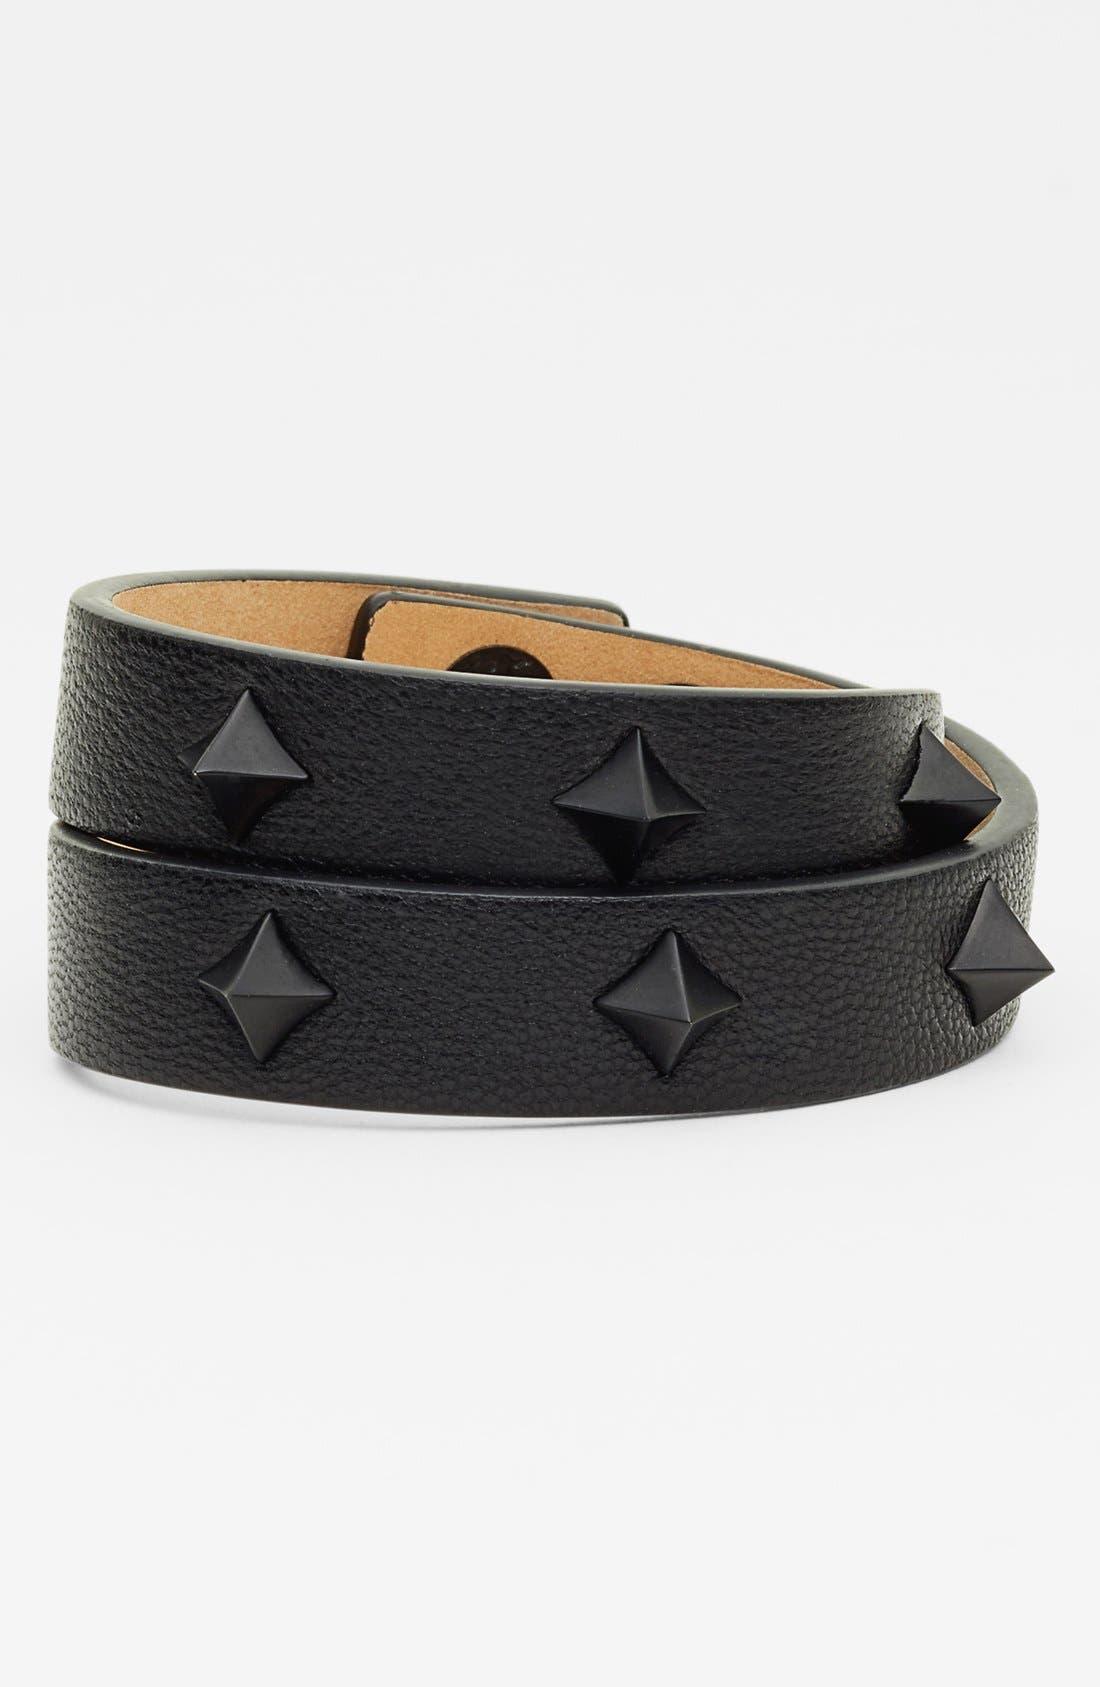 Main Image - Vince Camuto 'Tour of Duty' Studded Leather Wrap Bracelet